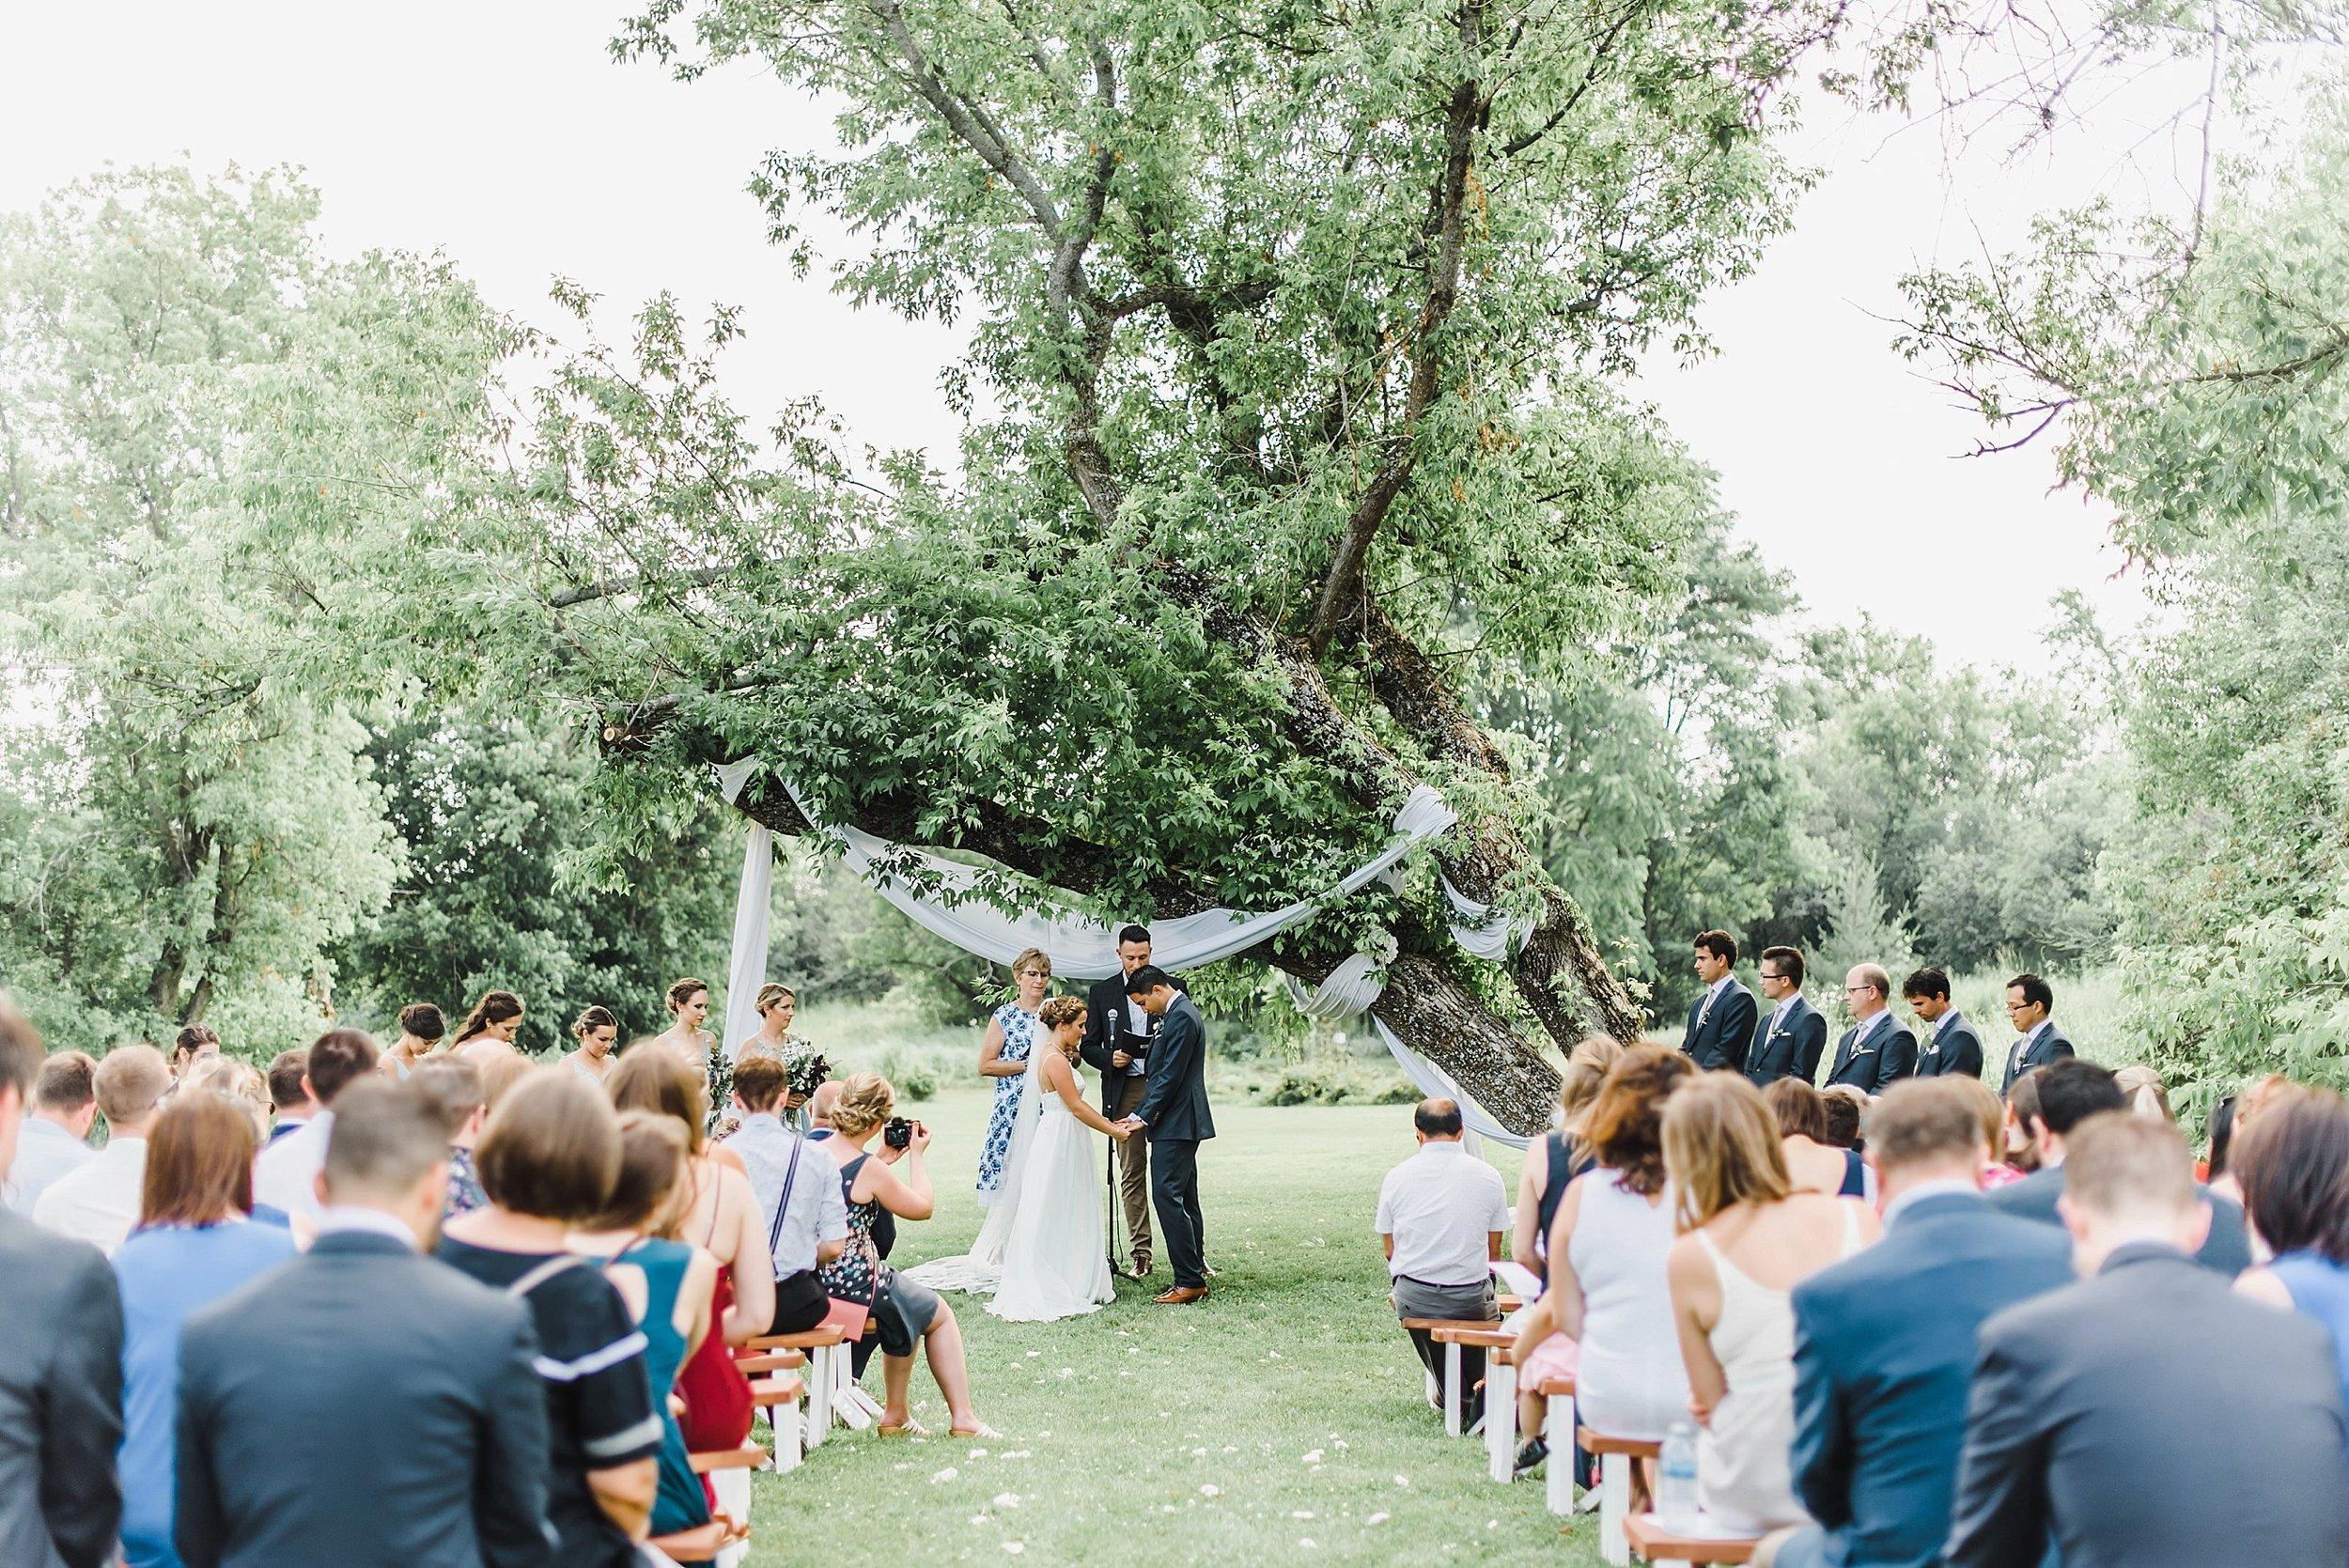 light airy indie fine art ottawa wedding photographer | Ali and Batoul Photography_0811.jpg